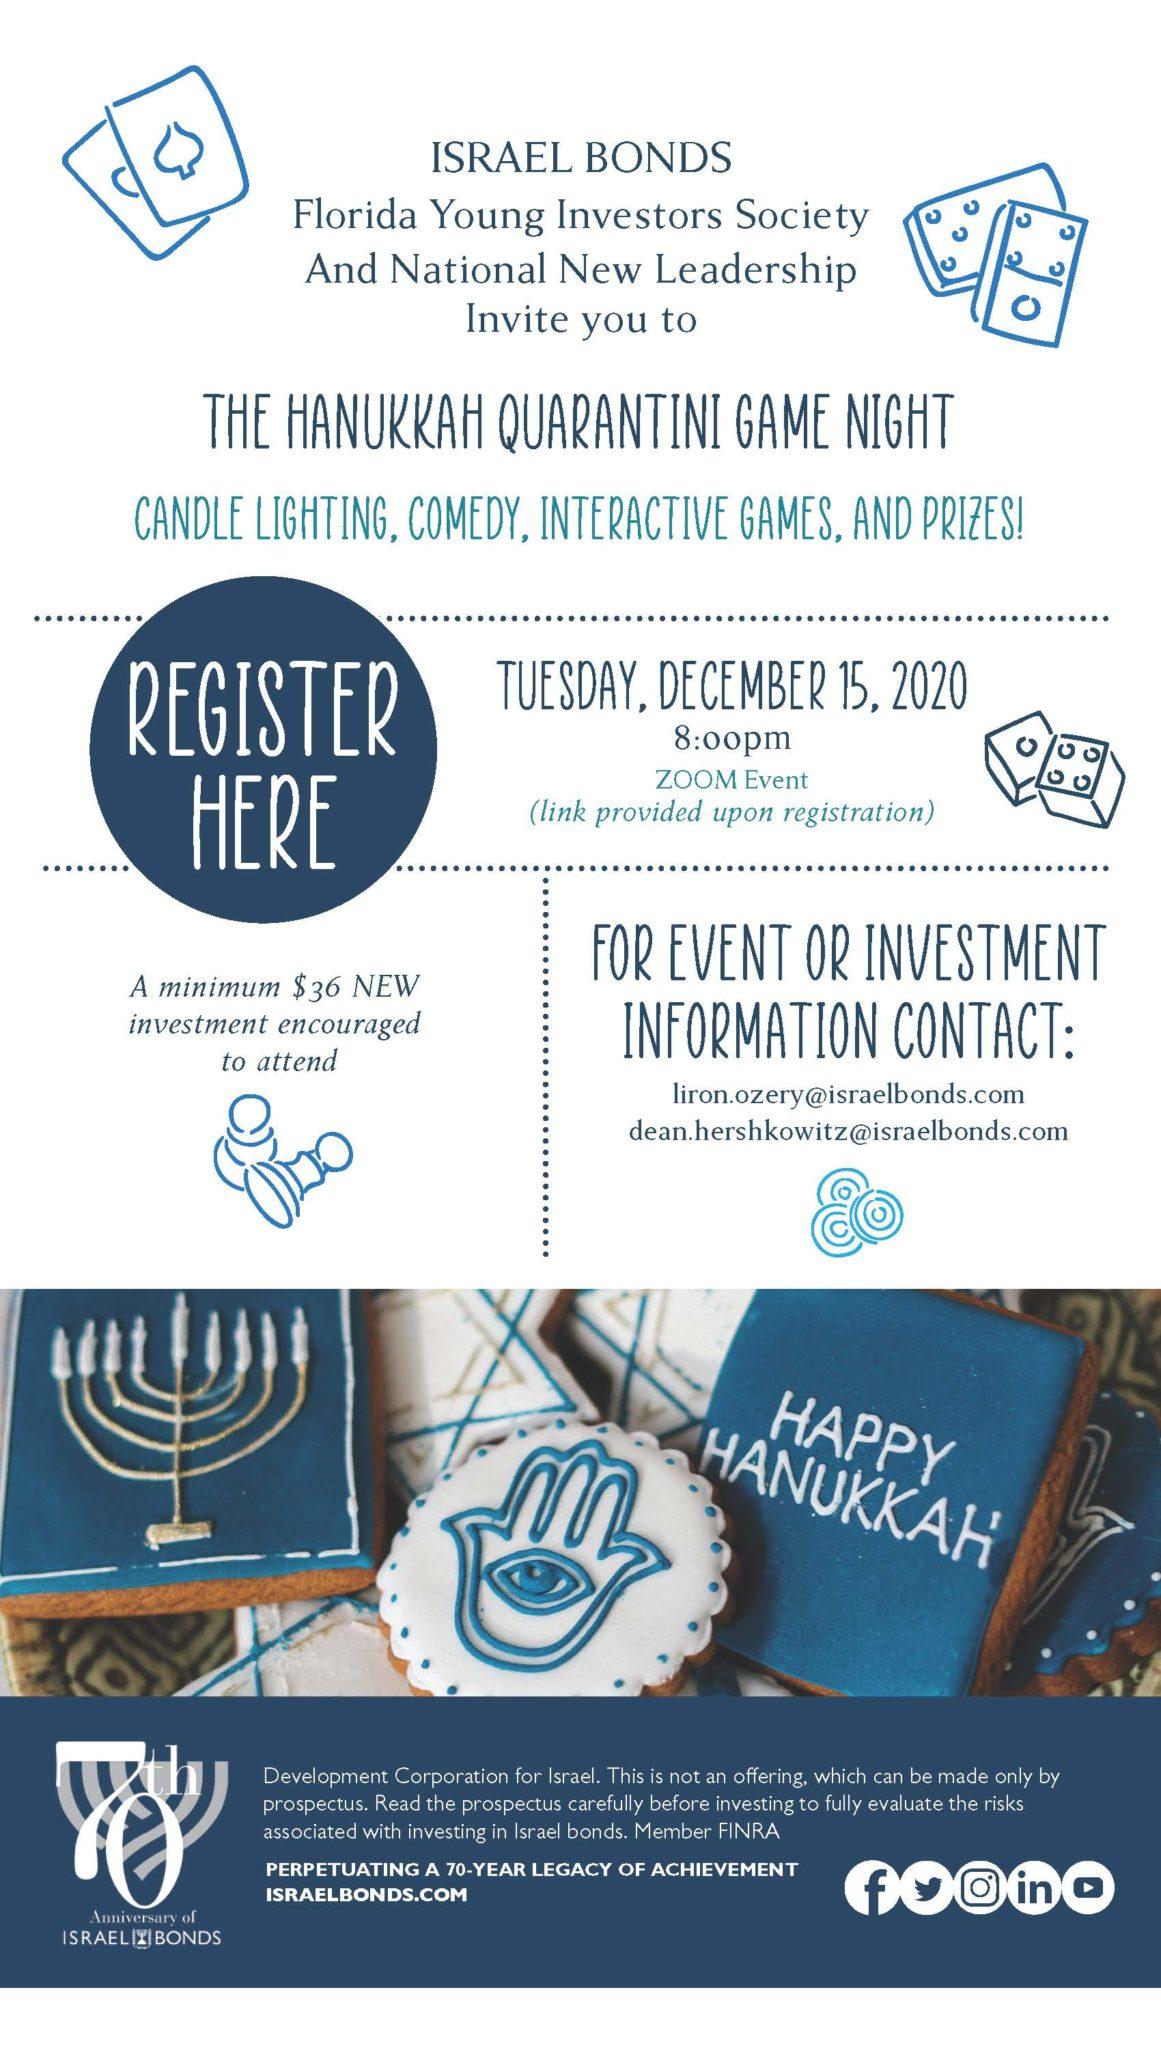 2014 Miami YIS Game Night Hanukkah Evite V2